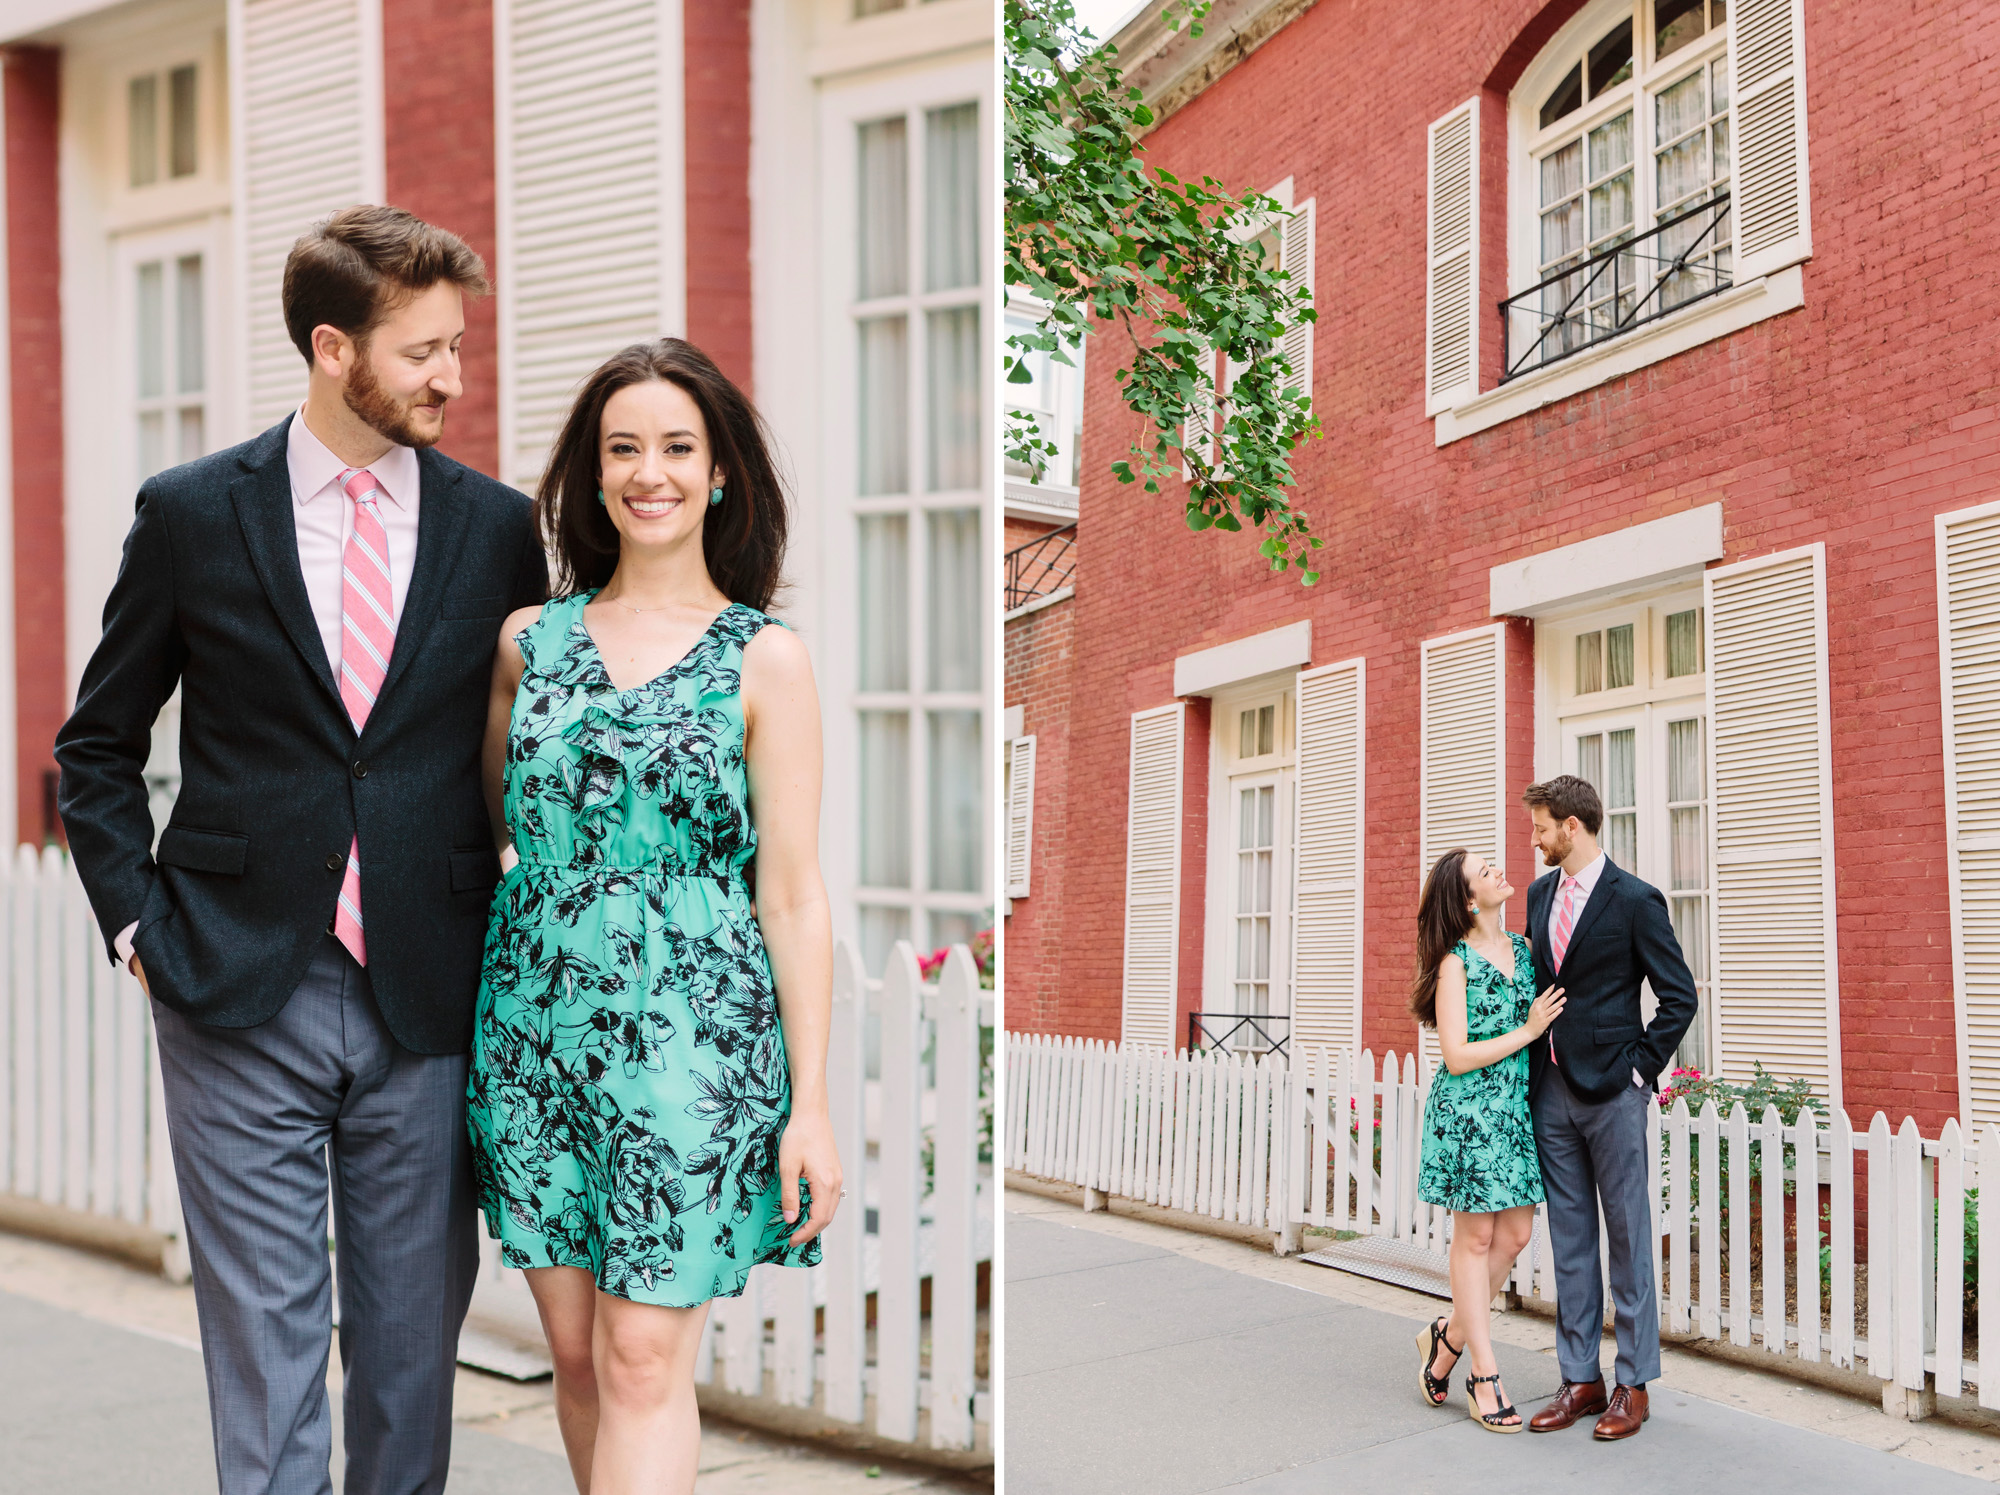 09_West_Village_New_York_Engagement_Photos.jpg